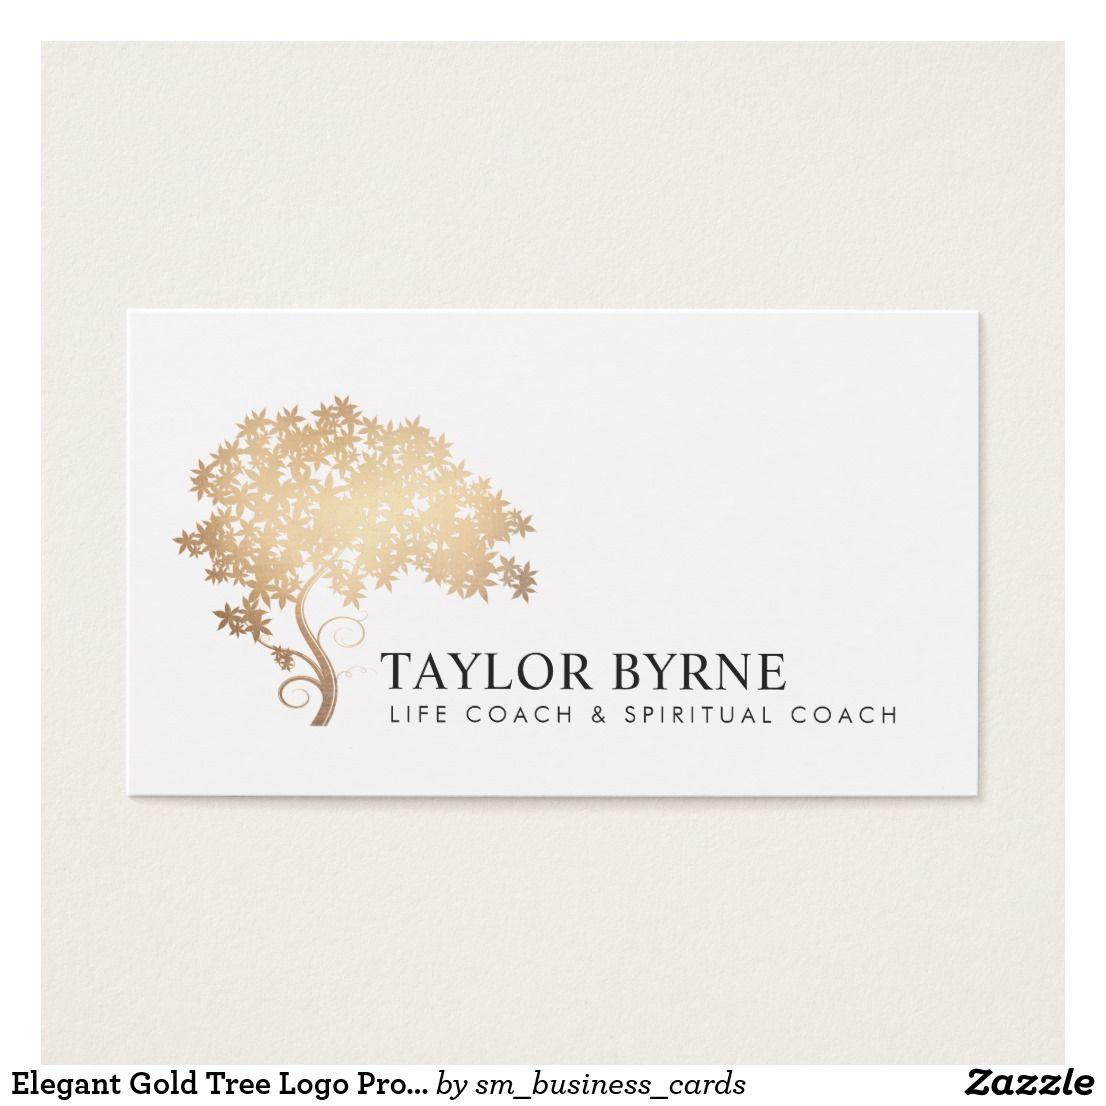 Elegant Gold Tree Logo Professional | Holistic Health and Natural ...